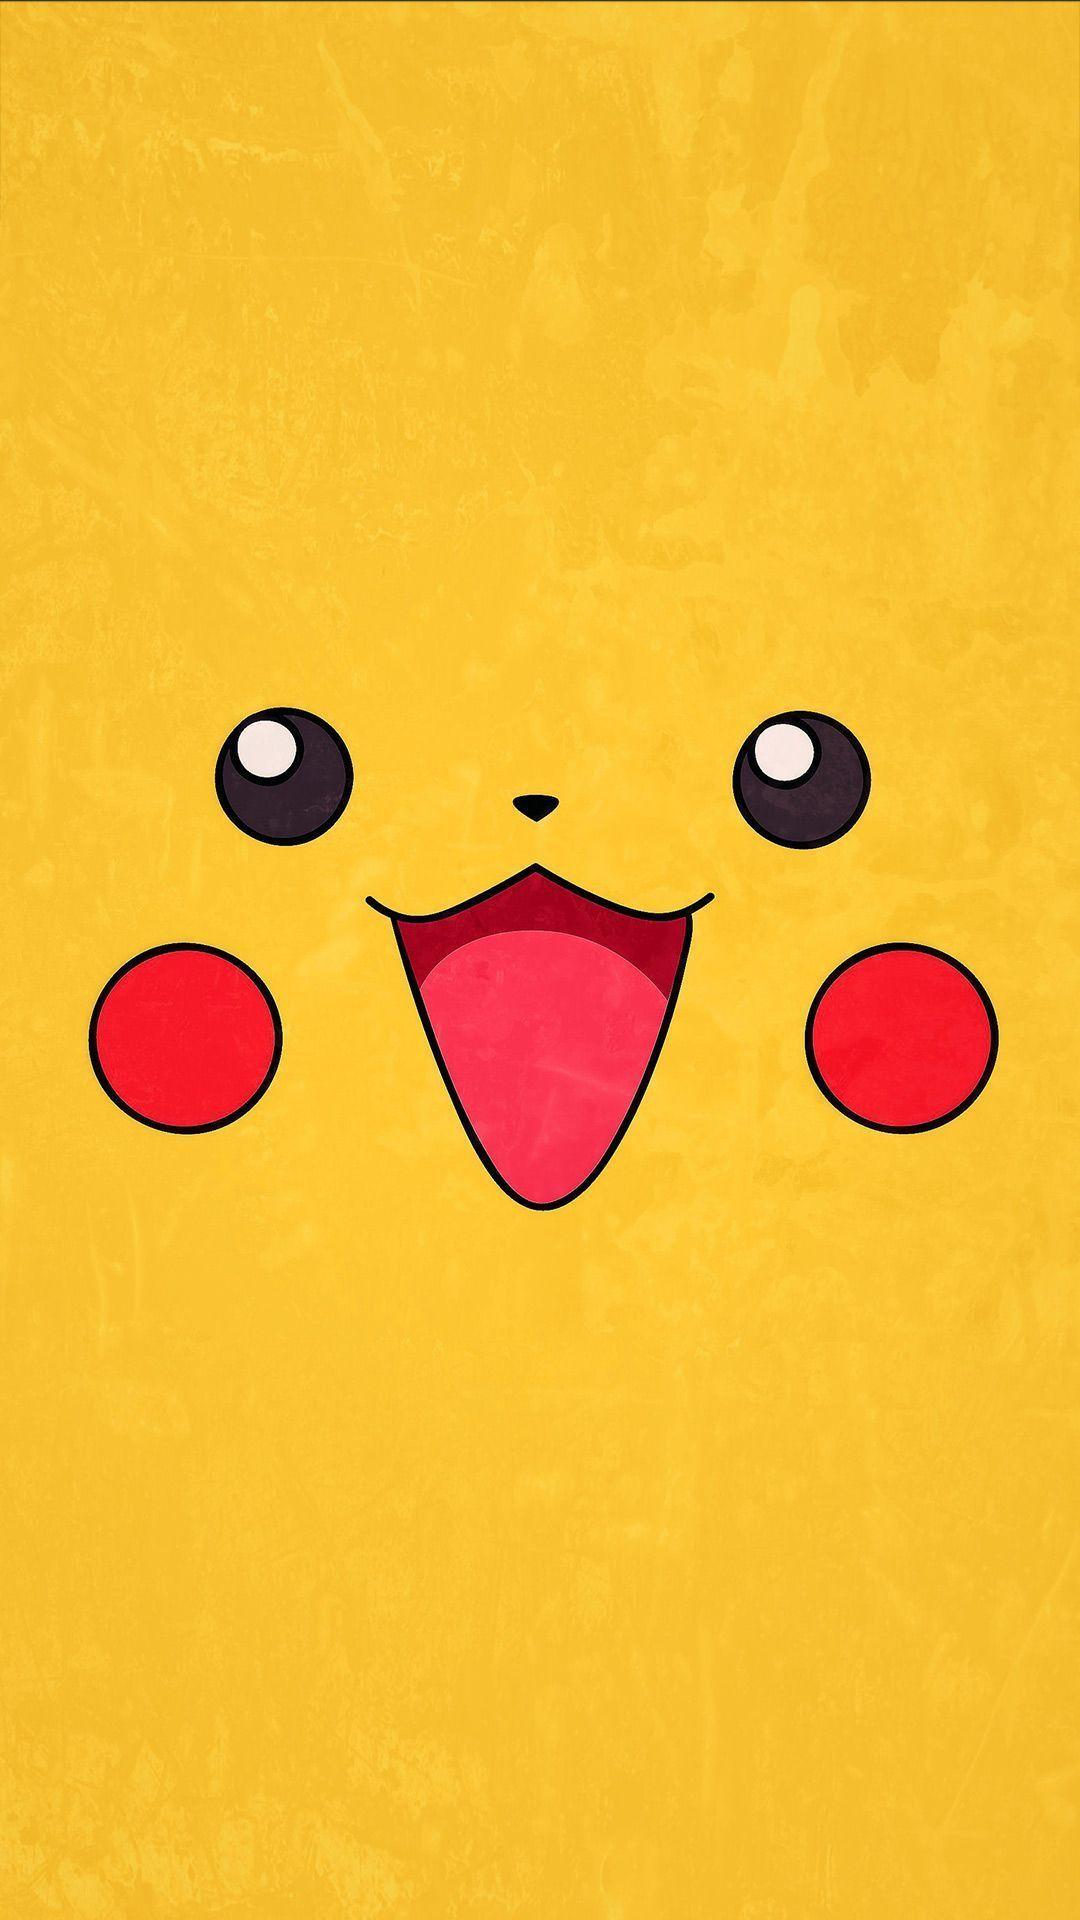 Free Pokemon IPhone Wallpapers